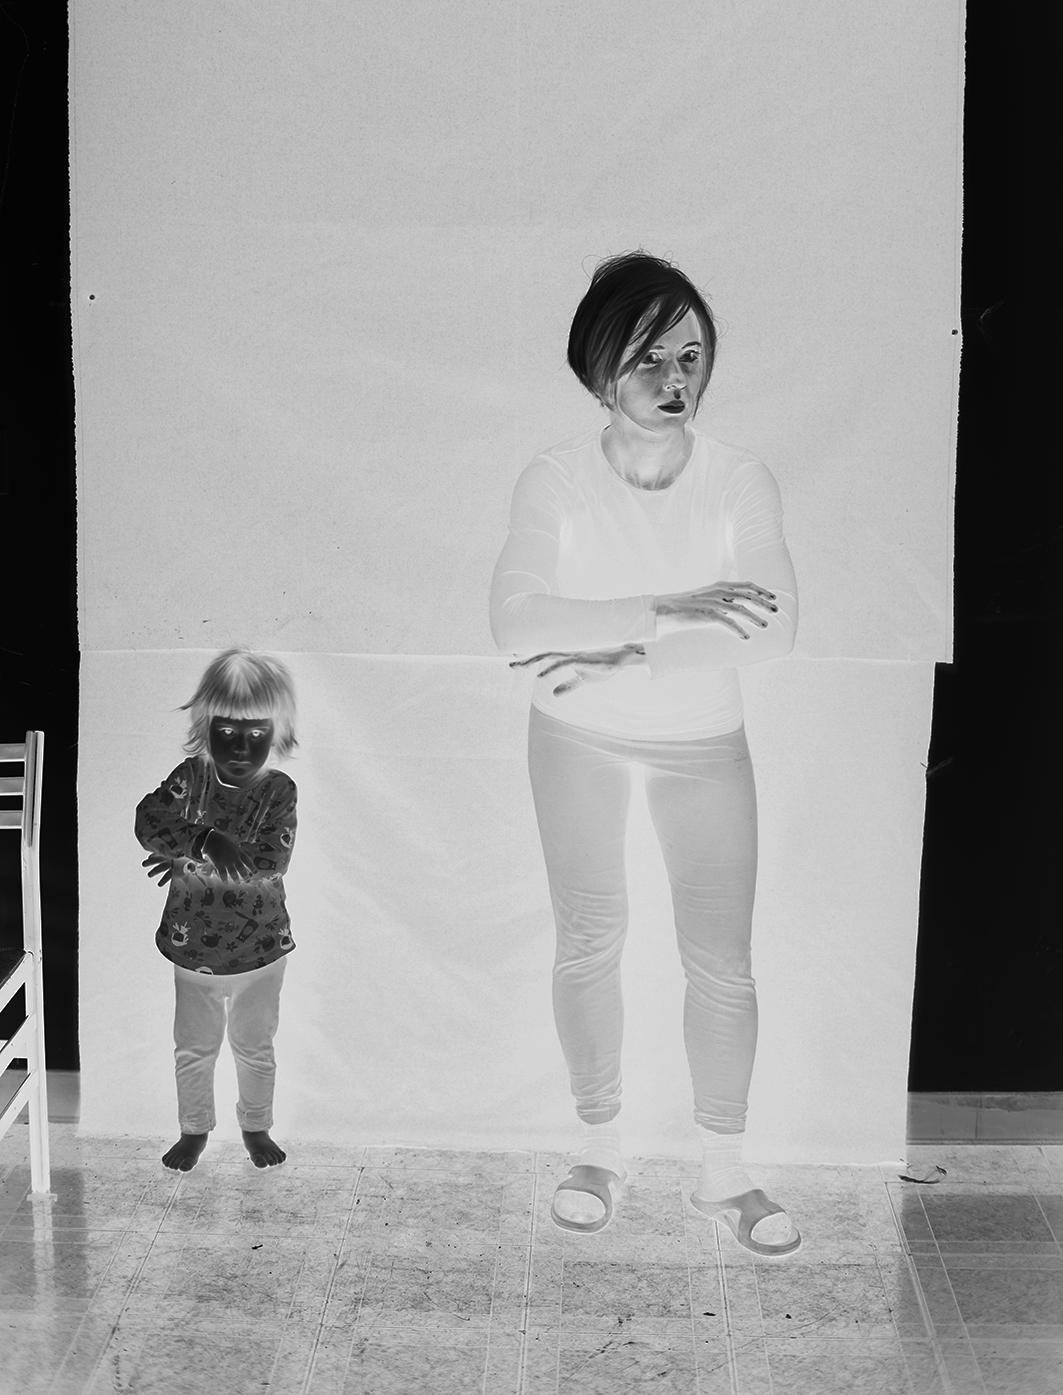 Aneta Grzeszykowska   Negative Book #25 , 2012-2013  Pigment ink on cotton paper  50 x 38 cm